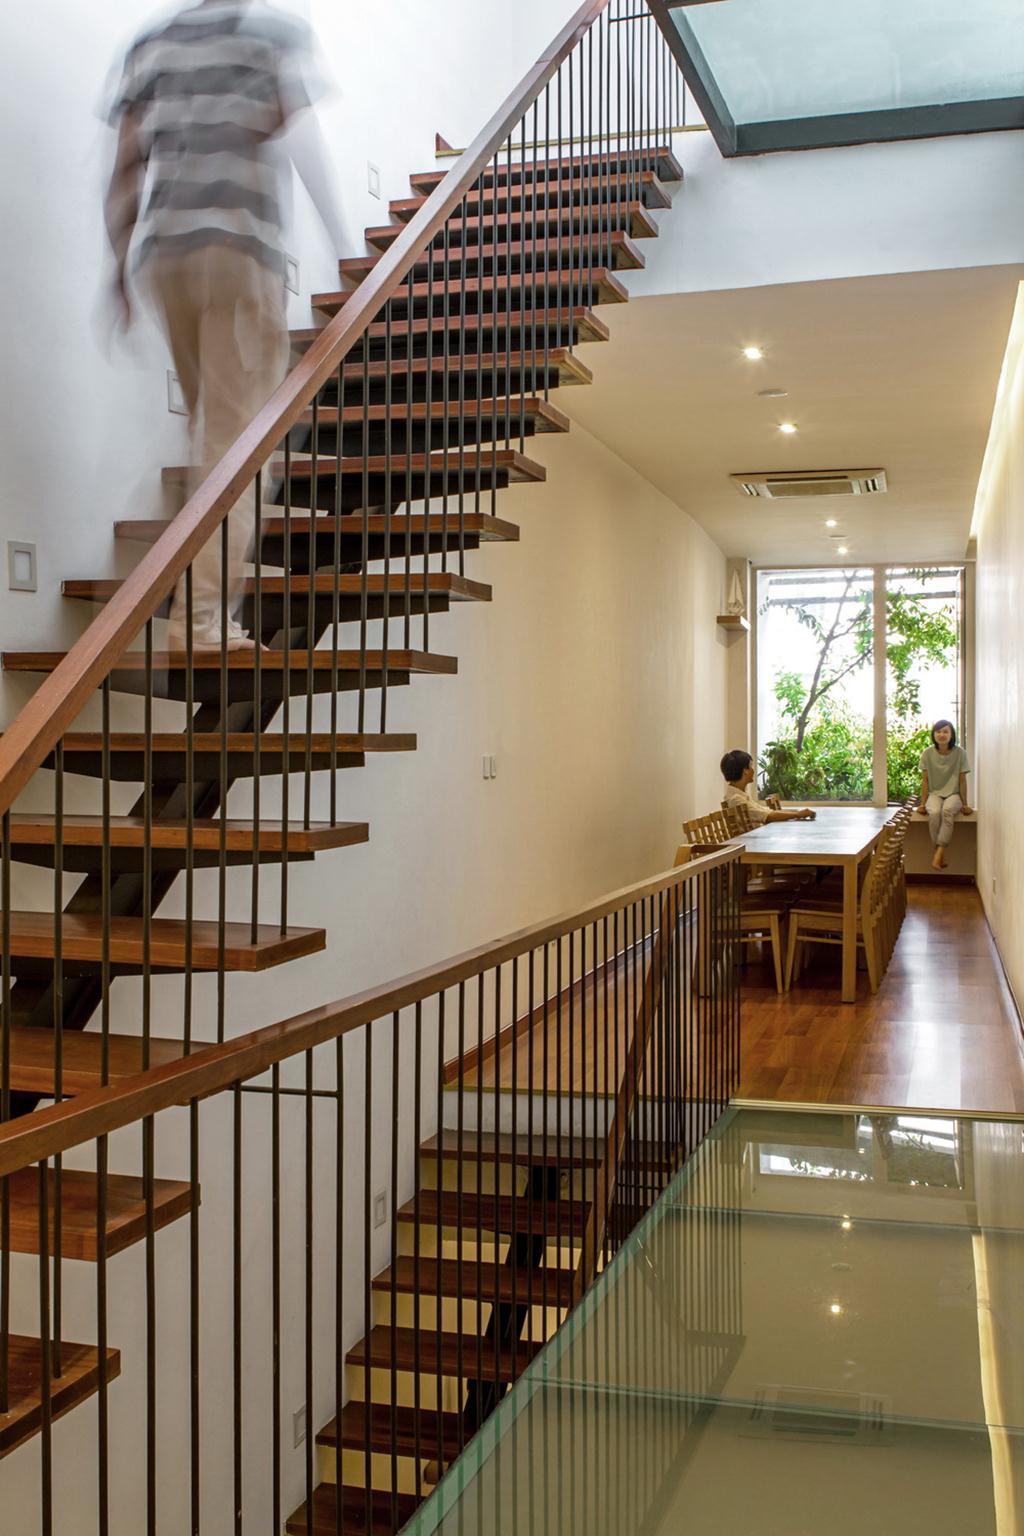 09_Staircase1_Hoang Le (Copy)